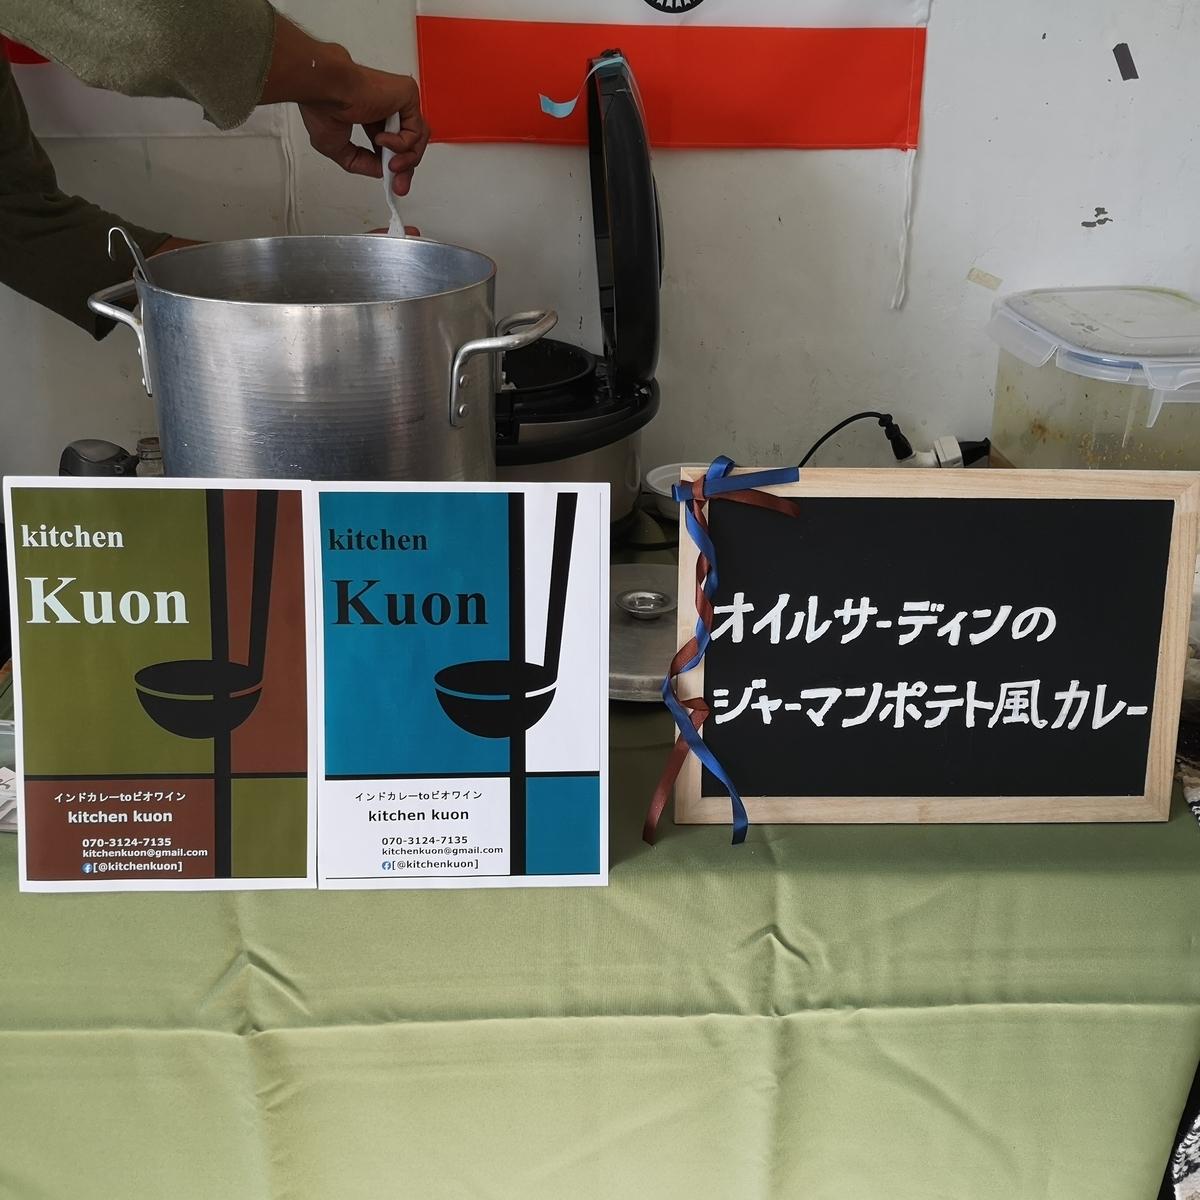 Kitchen Kuon オイルサーディンのジャーマンポテト風カレー